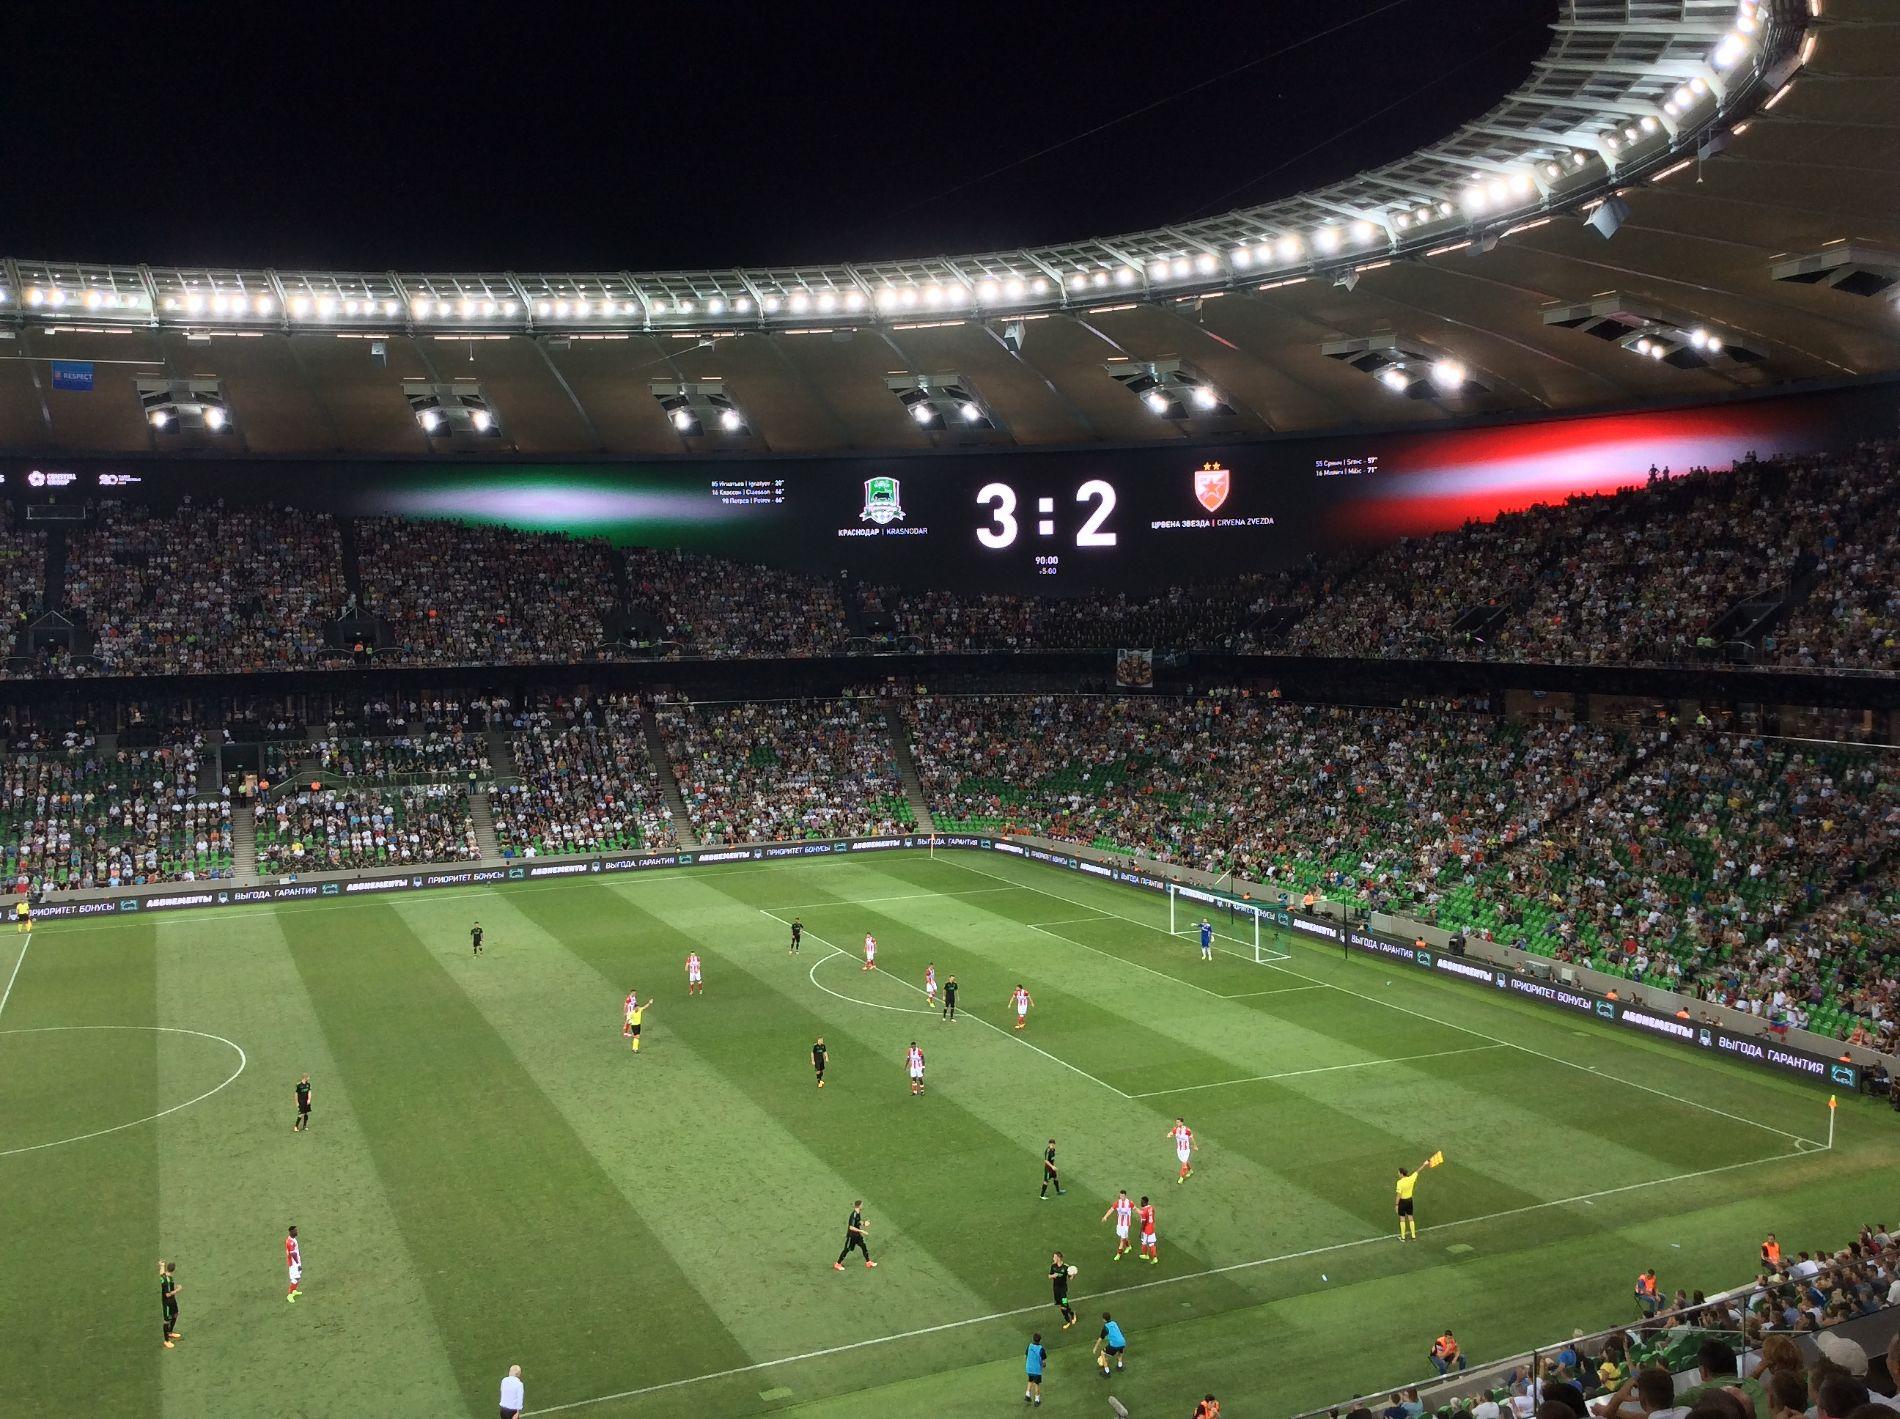 Матч плей-офф Лиги Европы «Краснодар» — «Црвена Звезда» ©Фото Юга.ру